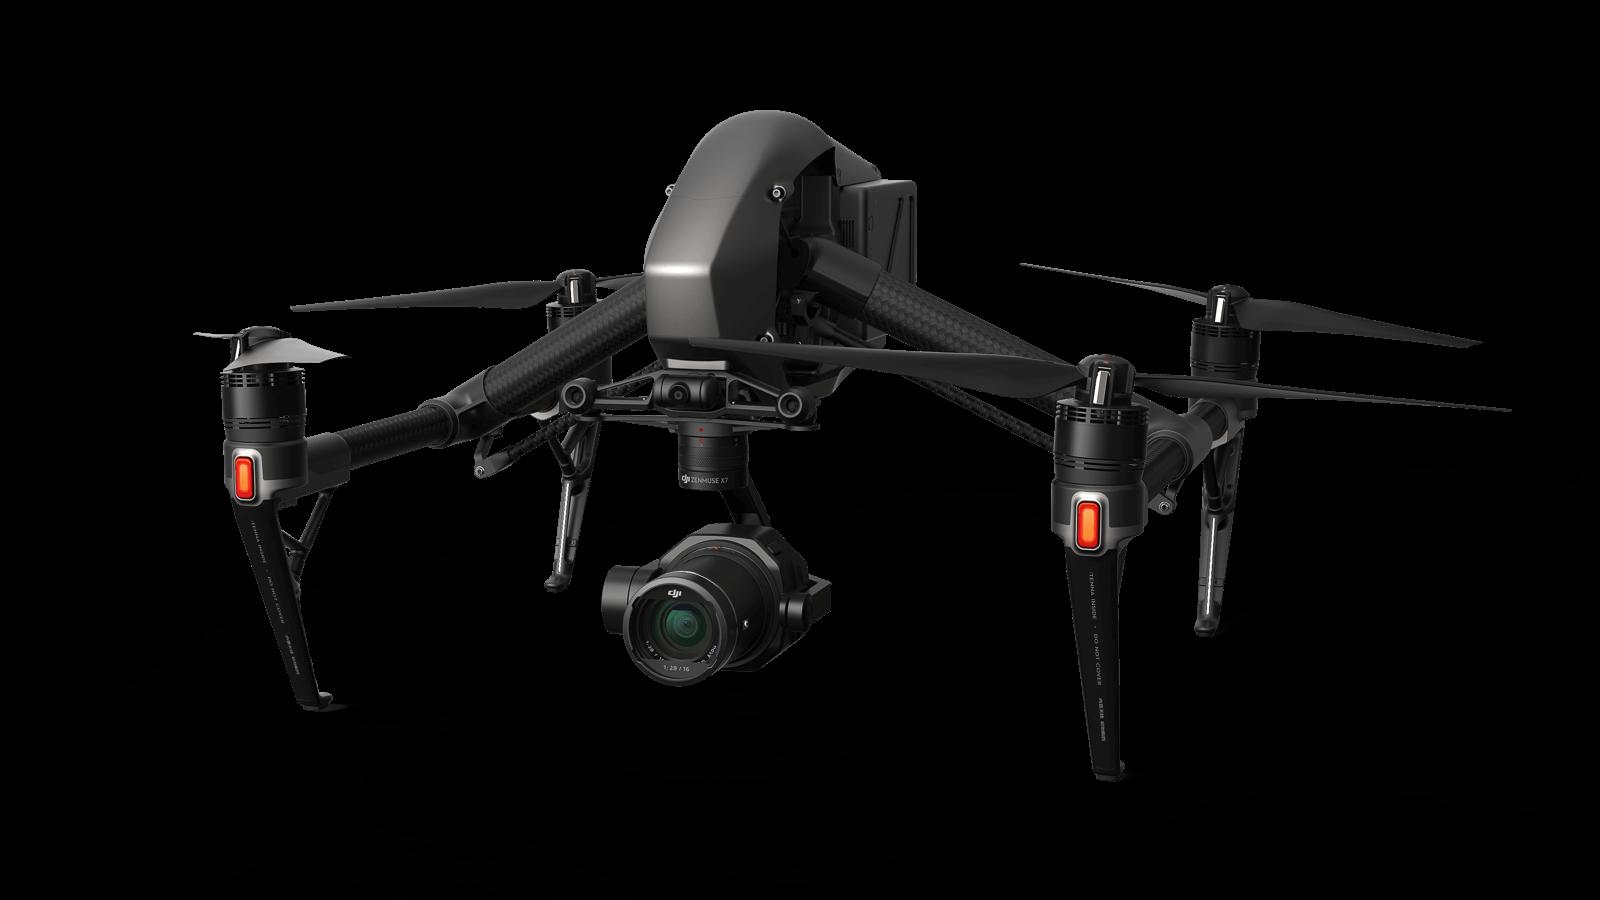 DJI Zenmuse X7: 6K Drohne für filmreifere Aufnahmen